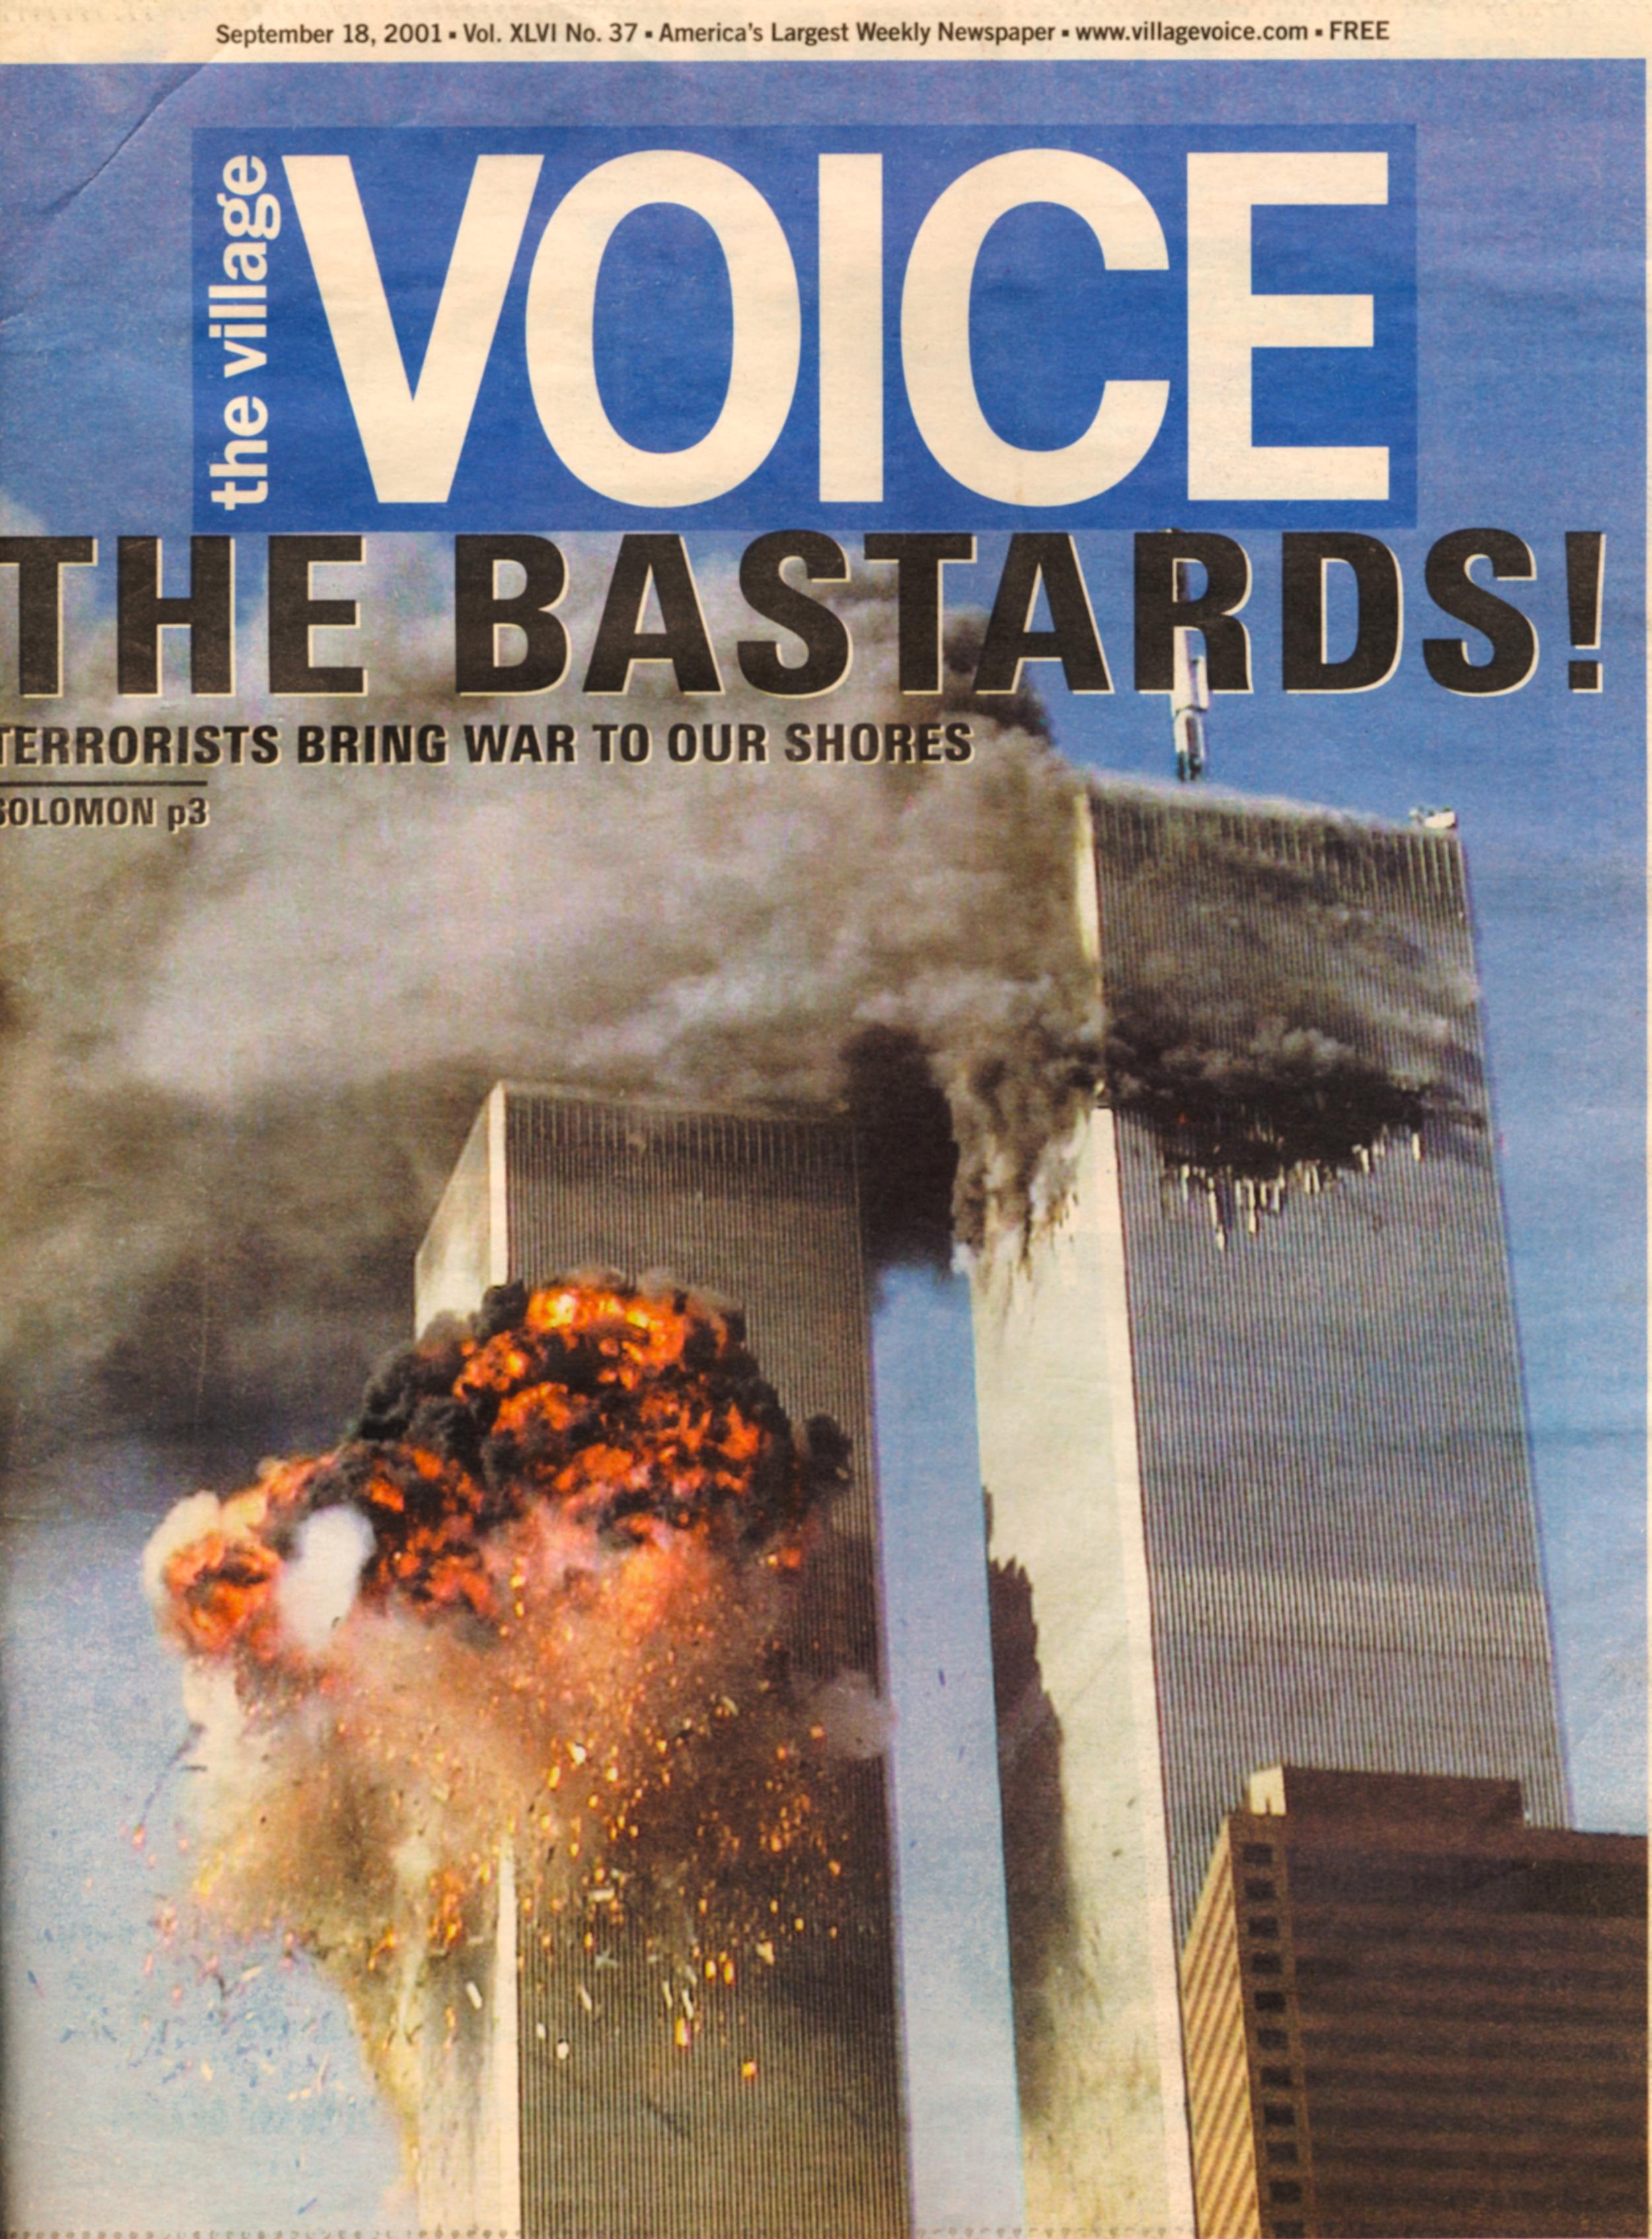 village-voice-sept-11-2001-cover.jpg